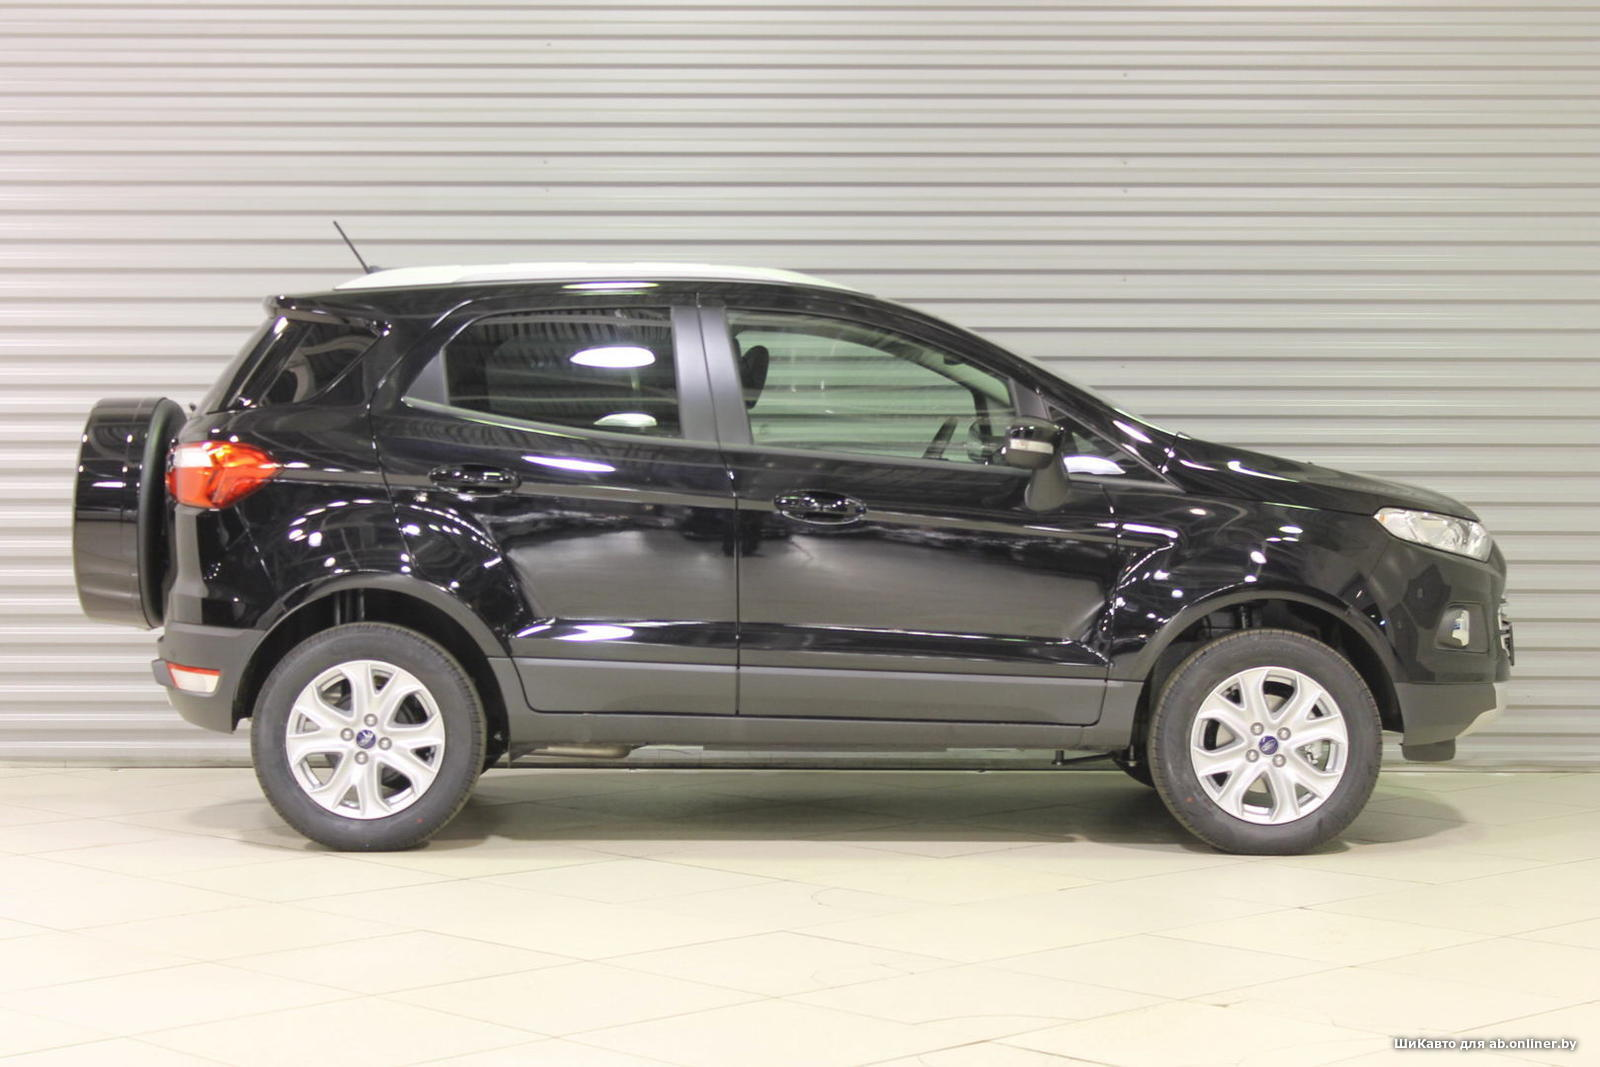 Ford EcoSport TITANIUM 1.6 АКПП 2WD